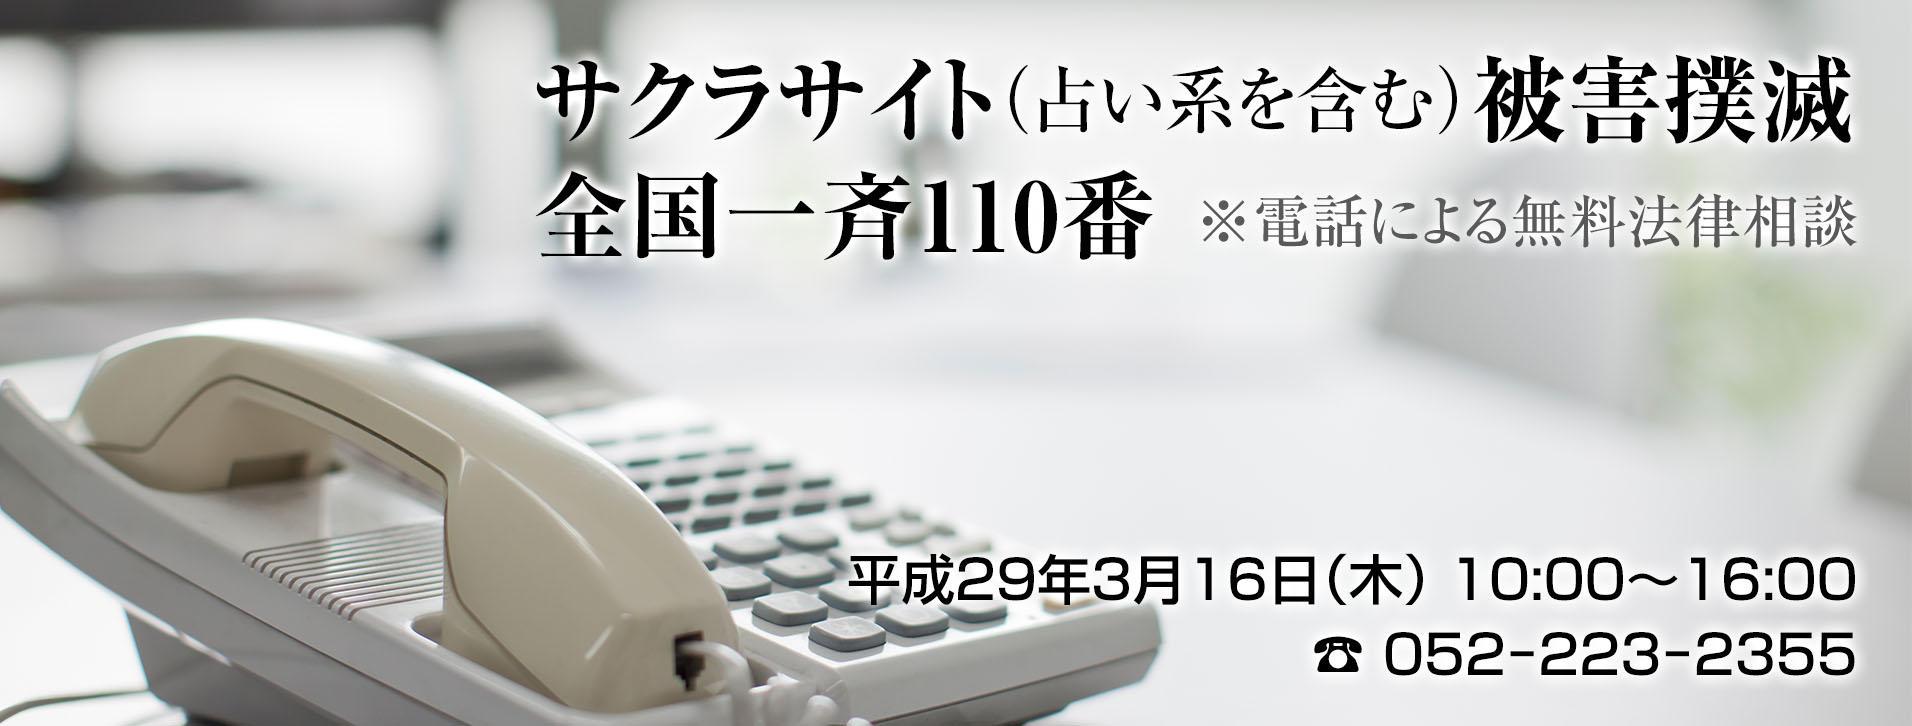 sakura-site-110.jpg